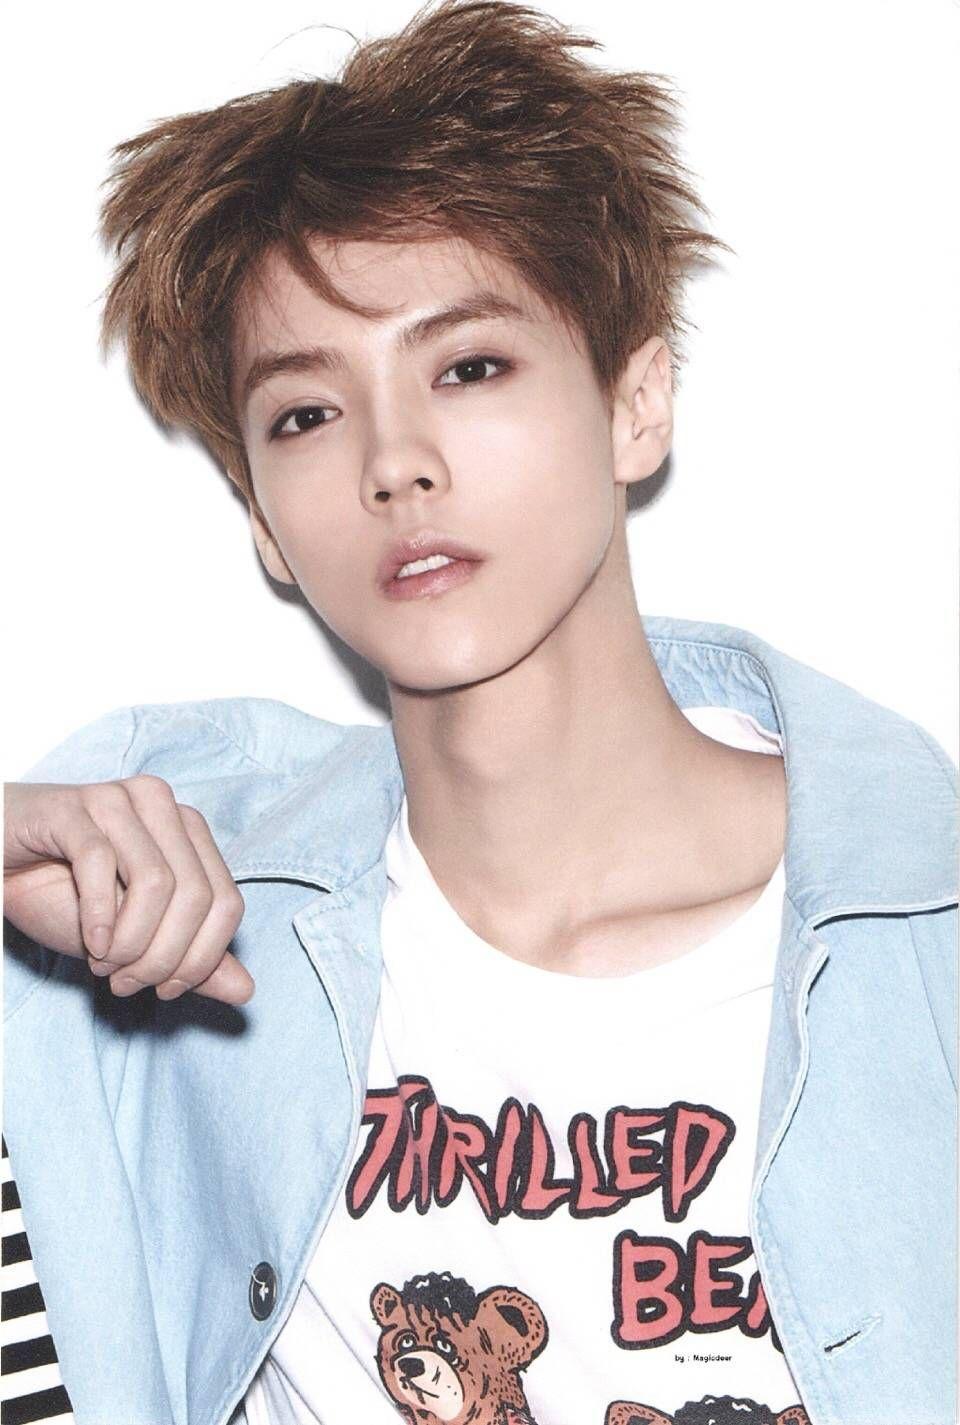 Official haircut for boys luhan 鹿晗 crlogo  kpop  pinterest  luhan kpop and exo